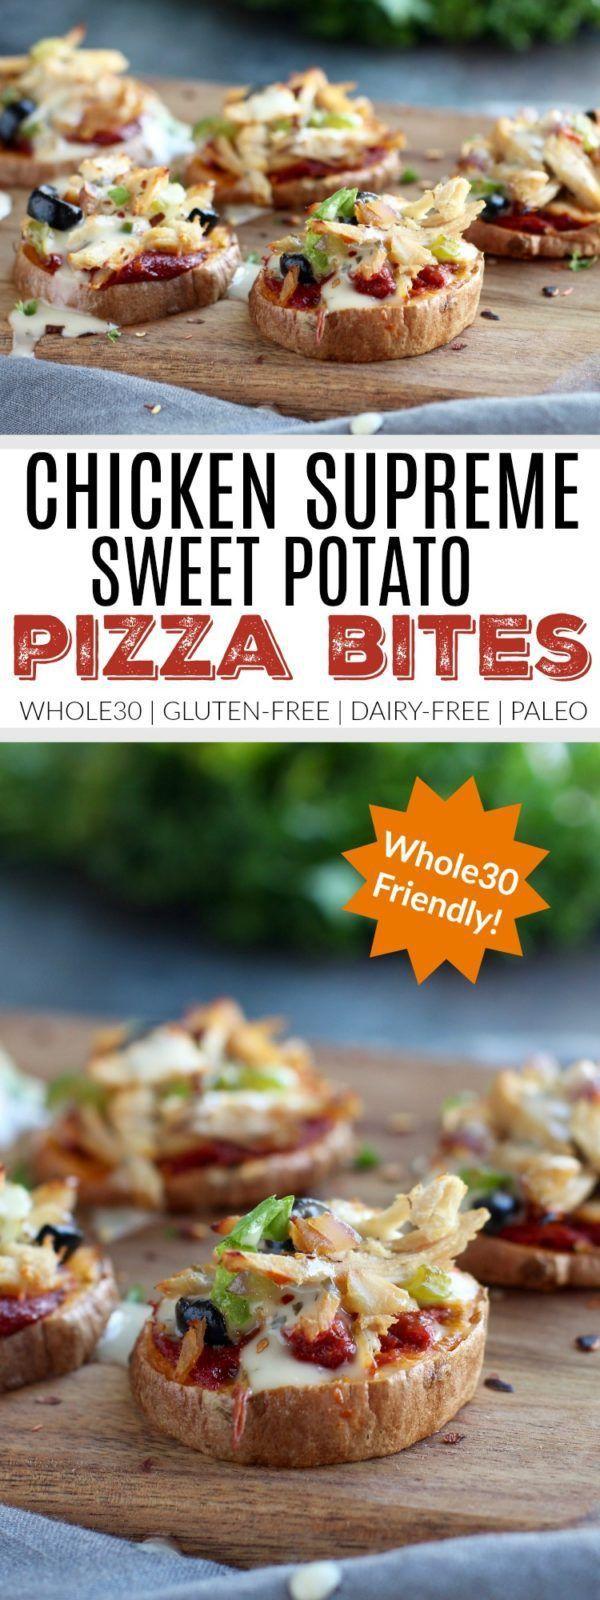 Chicken Supreme Sweet Potato Pizza Bites (Omit cheese)